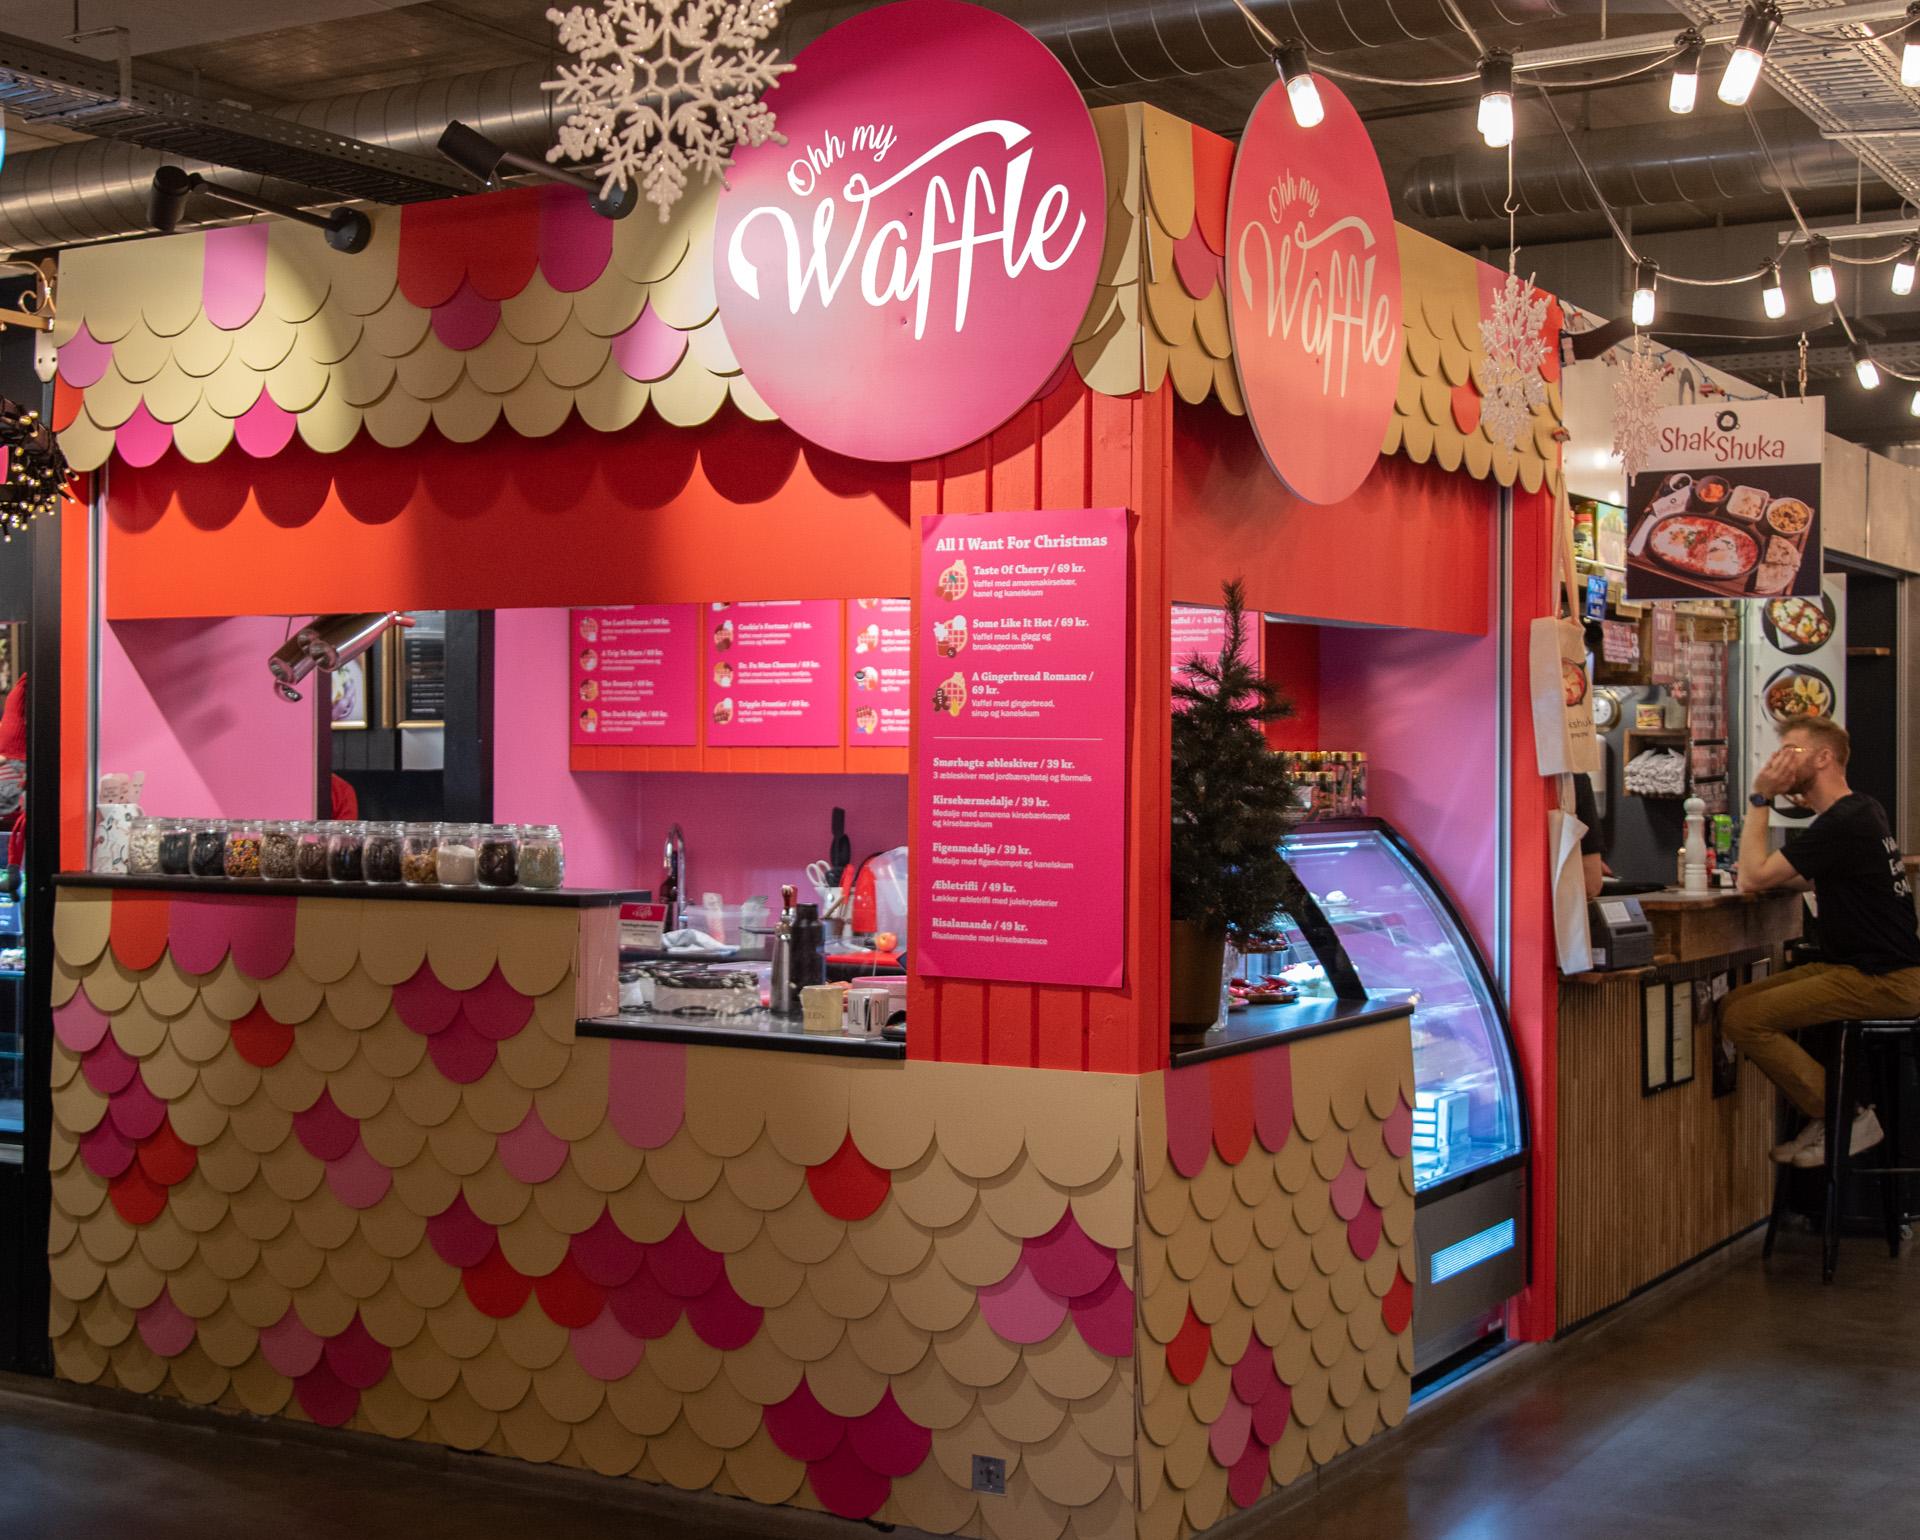 Ny vaffelbod: Ny vaffelbod: Ohh my Waffle er åbnet på Aarhus Central Food Market